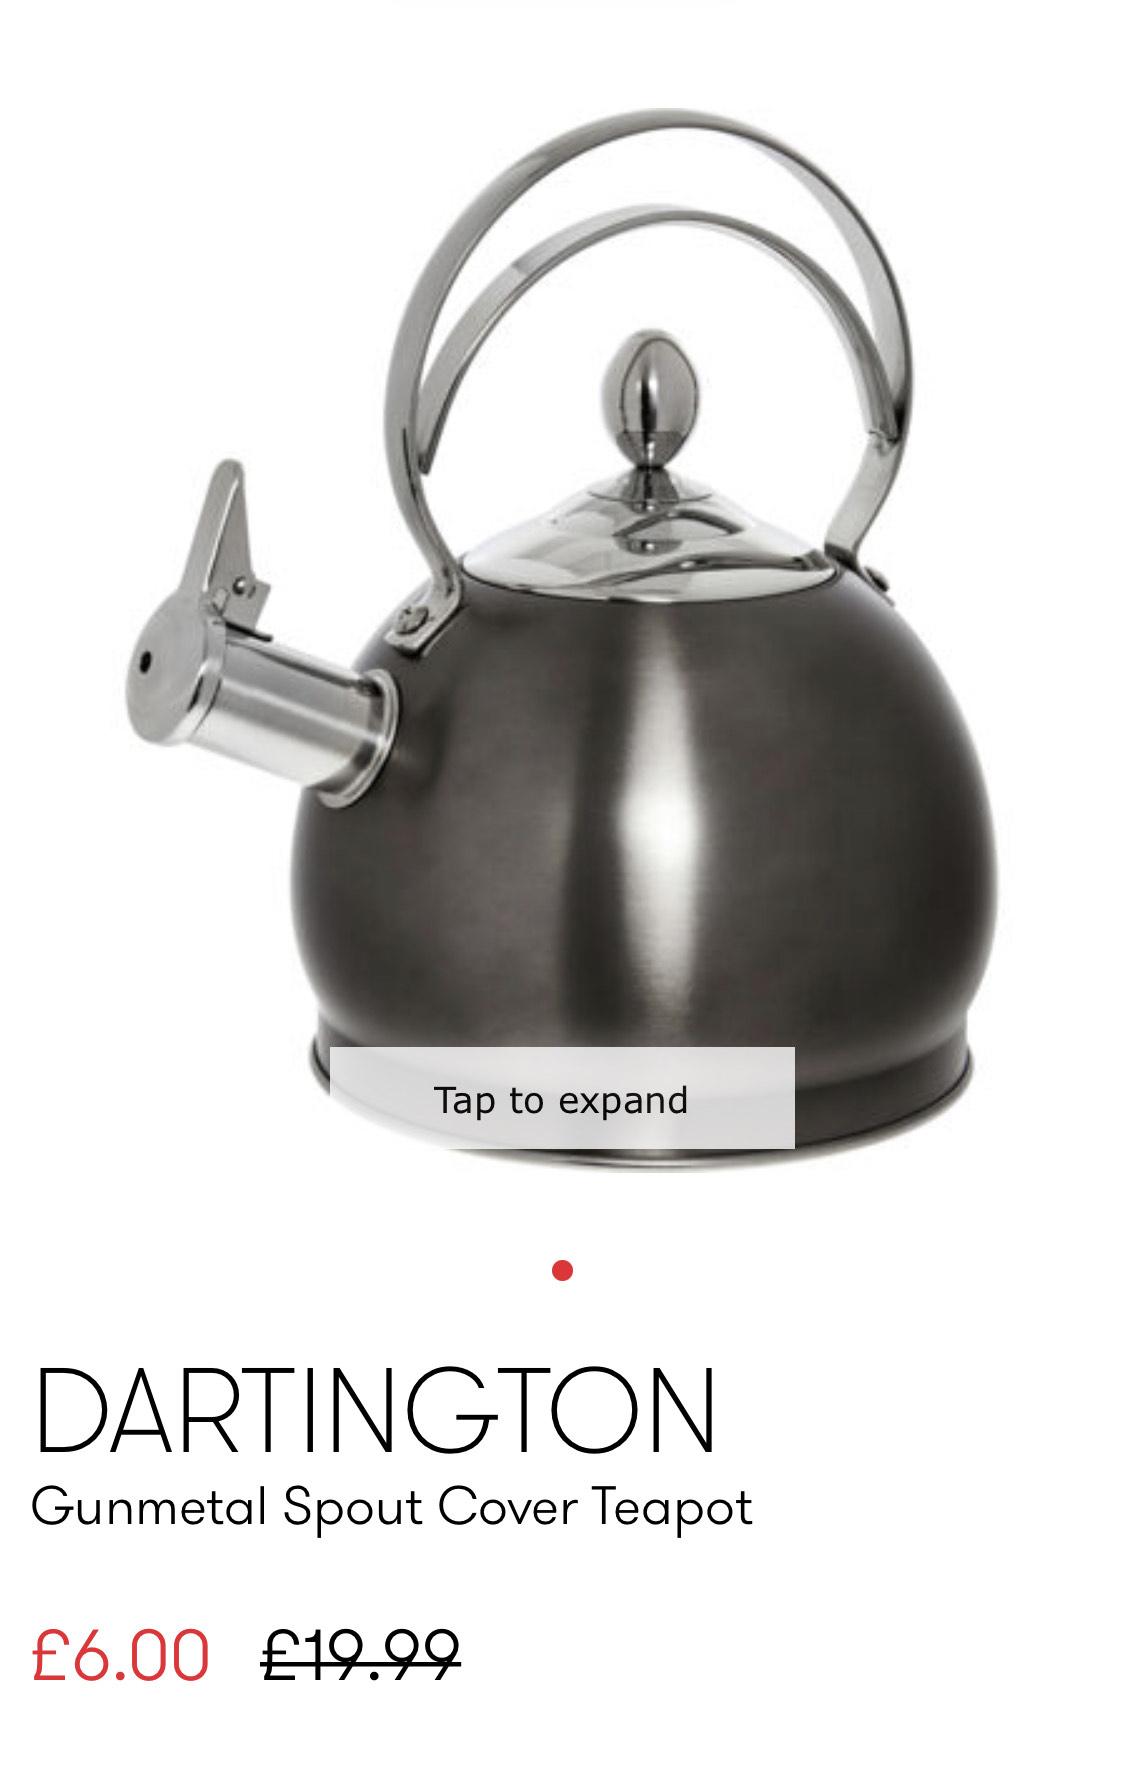 Dartington Gunmetal Spout Cover Teapot £9.99 delivered @ TKMaxx